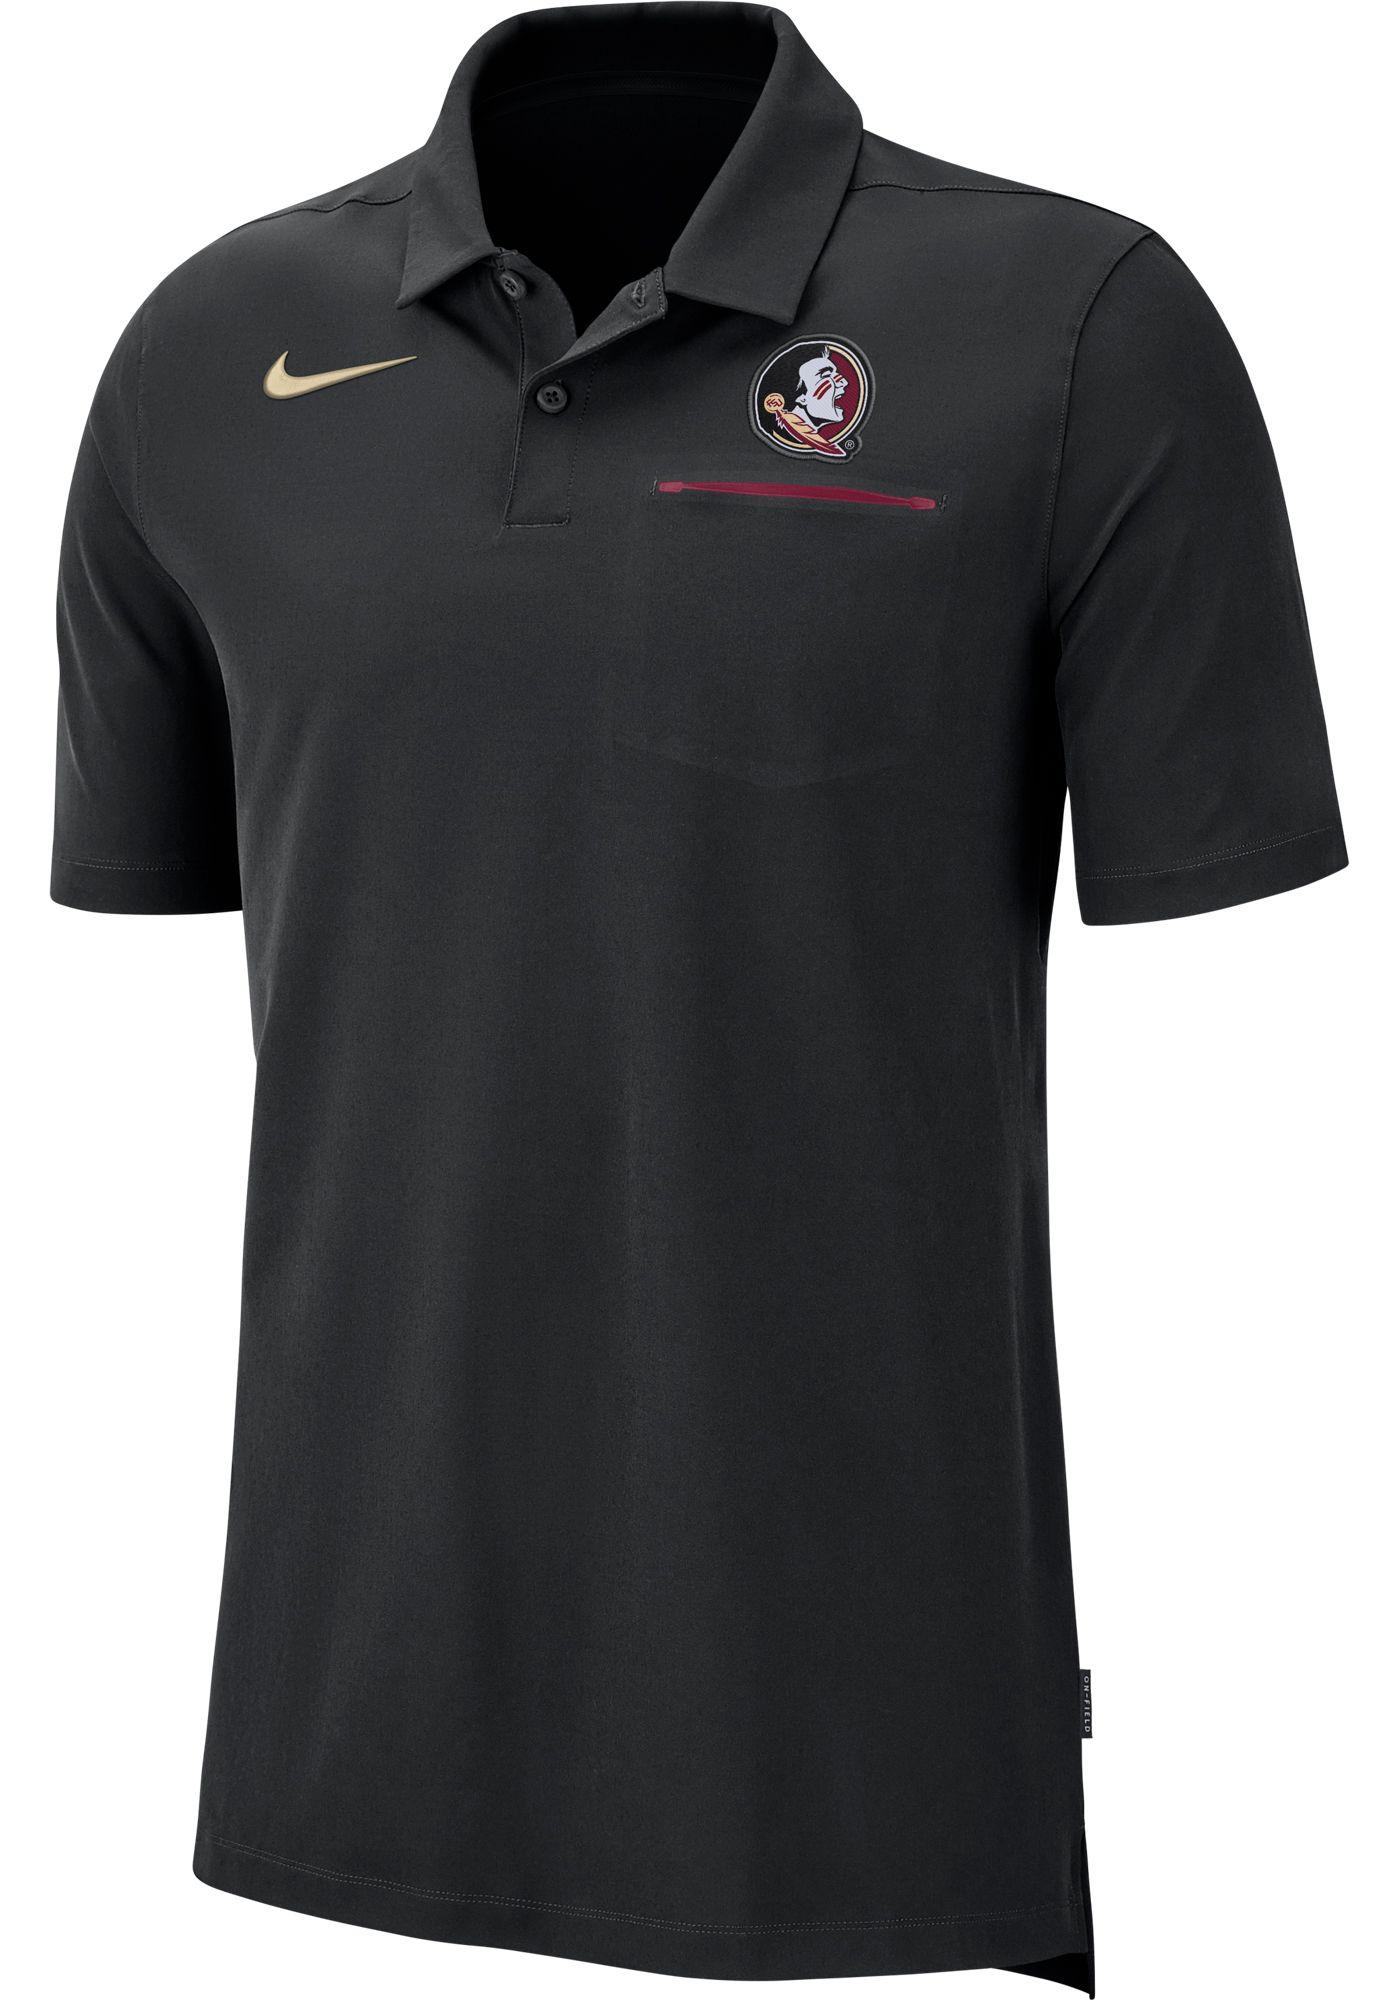 Nike Men's Florida State Seminoles Dri-FIT Elite Football Sideline Black Polo